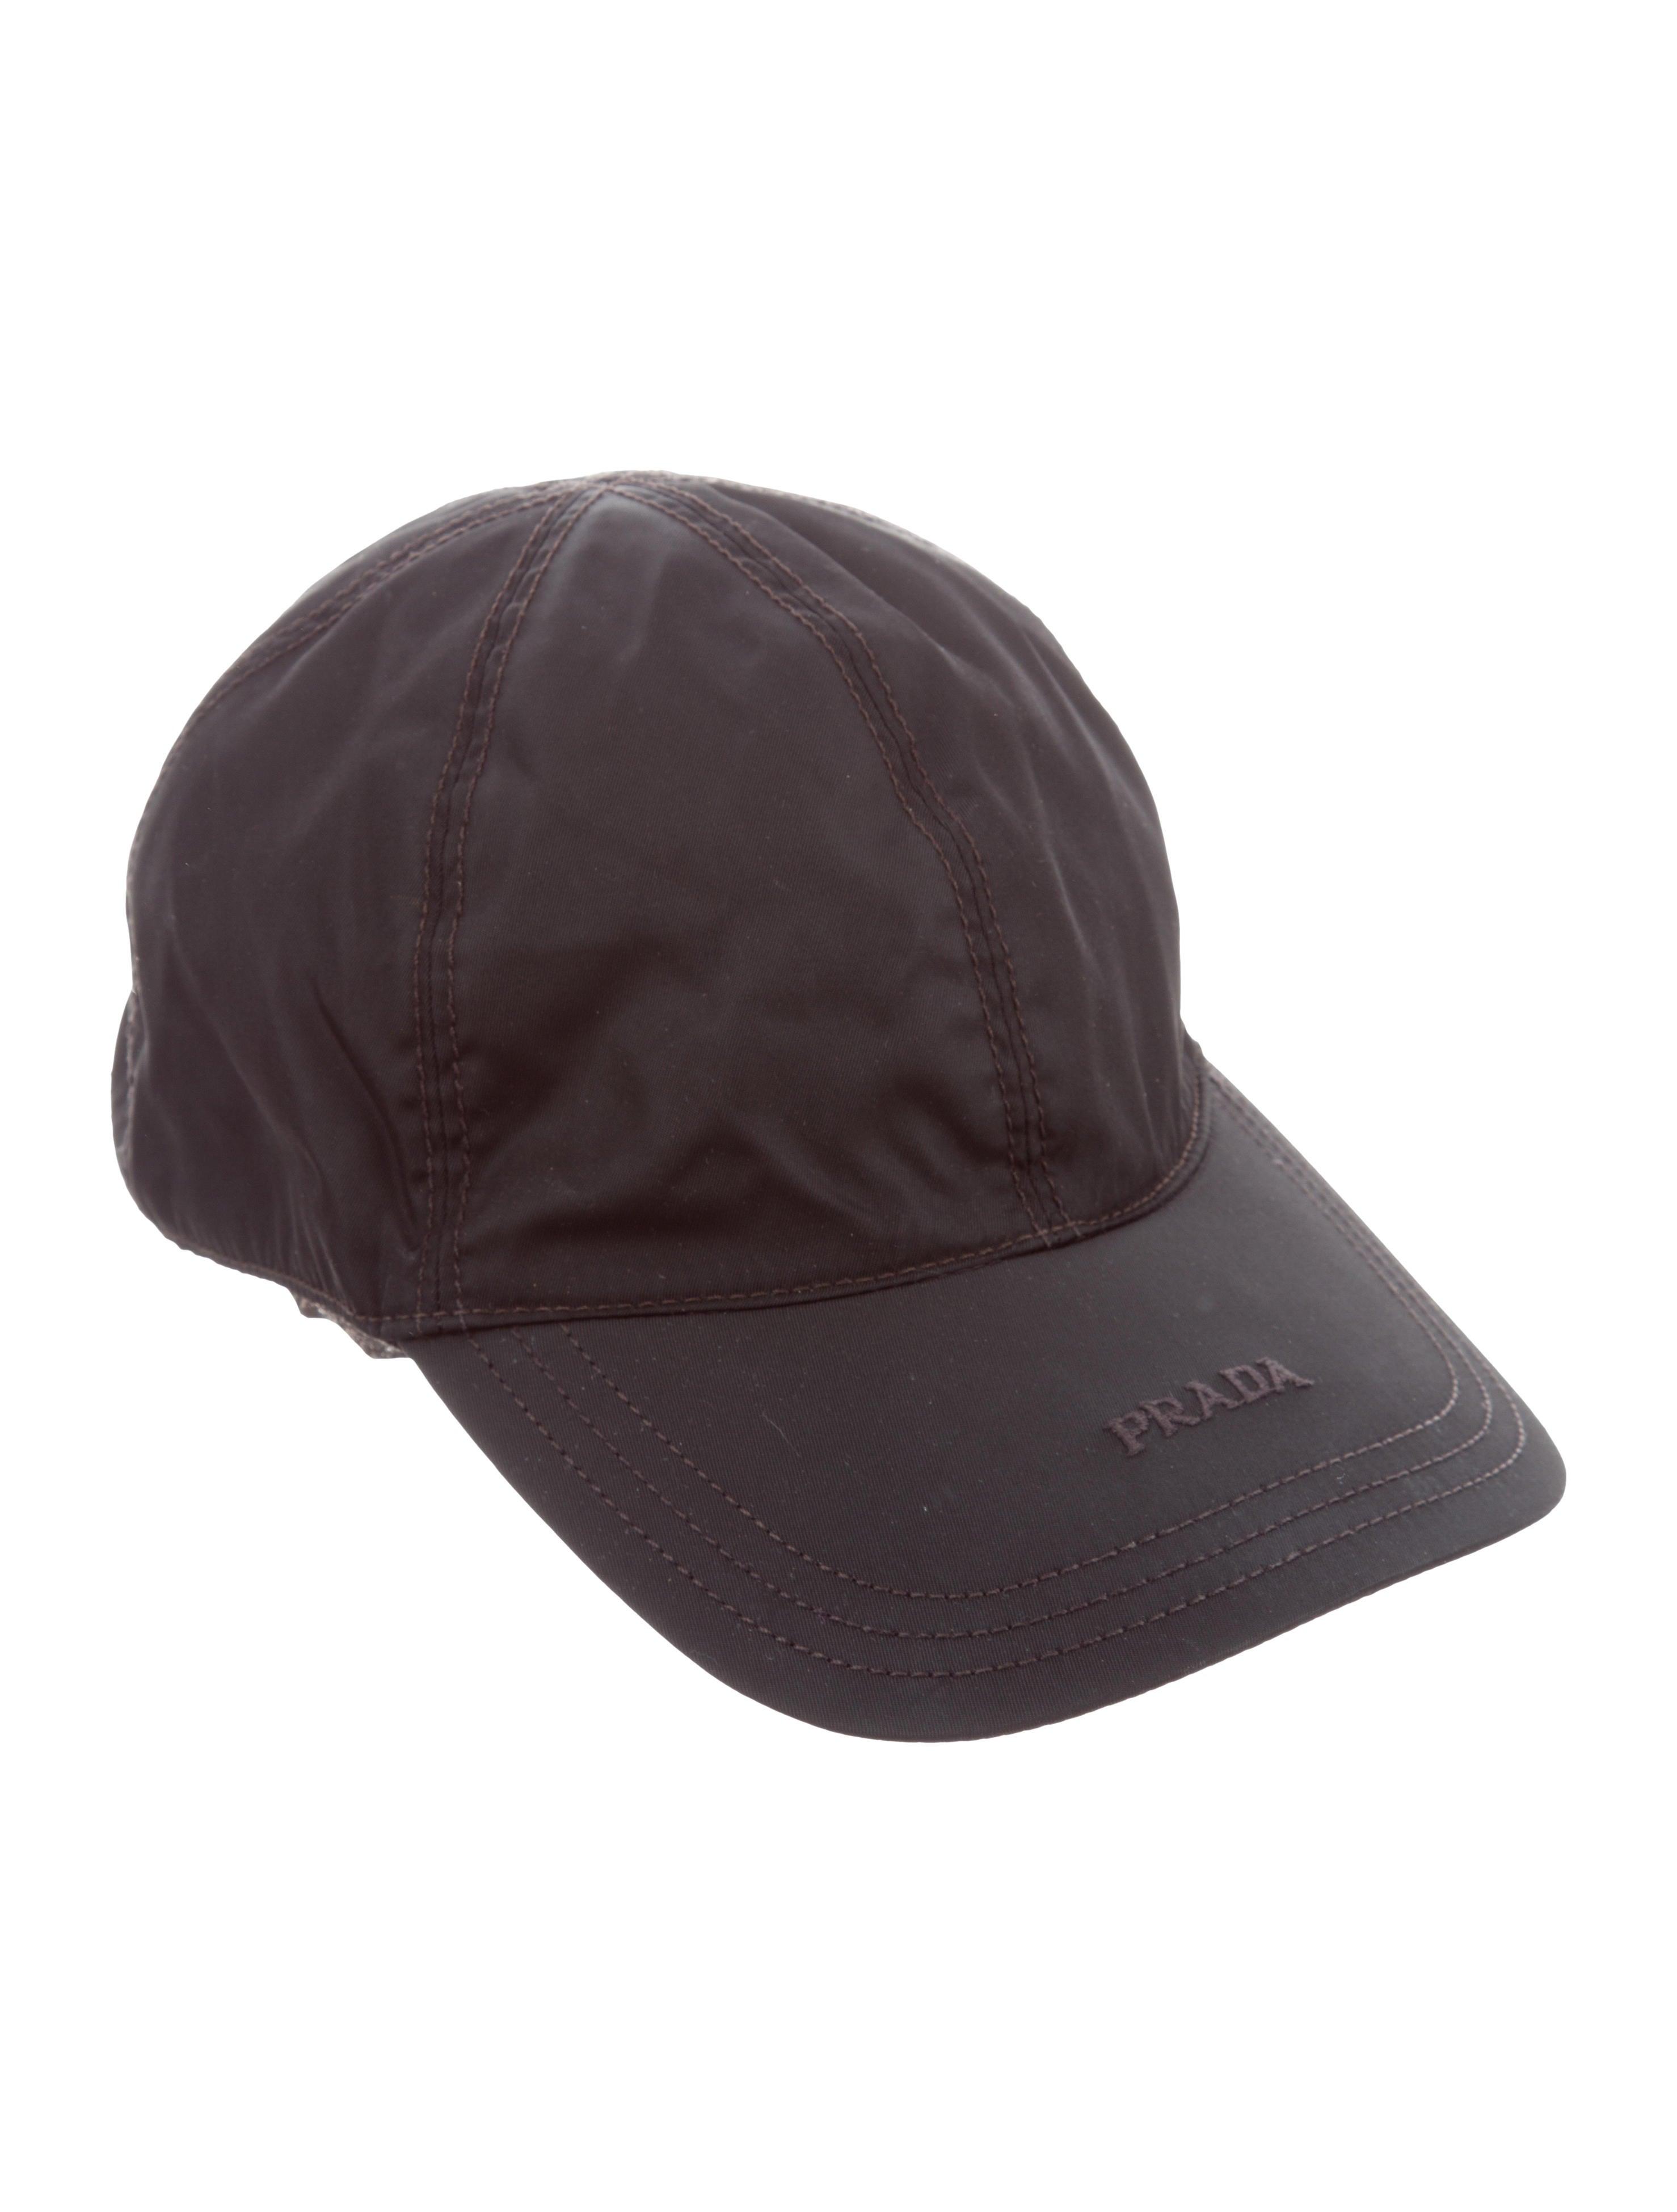 Prada Logo Baseball Cap - Accessories - PRA229187  bf1fbe8cf77